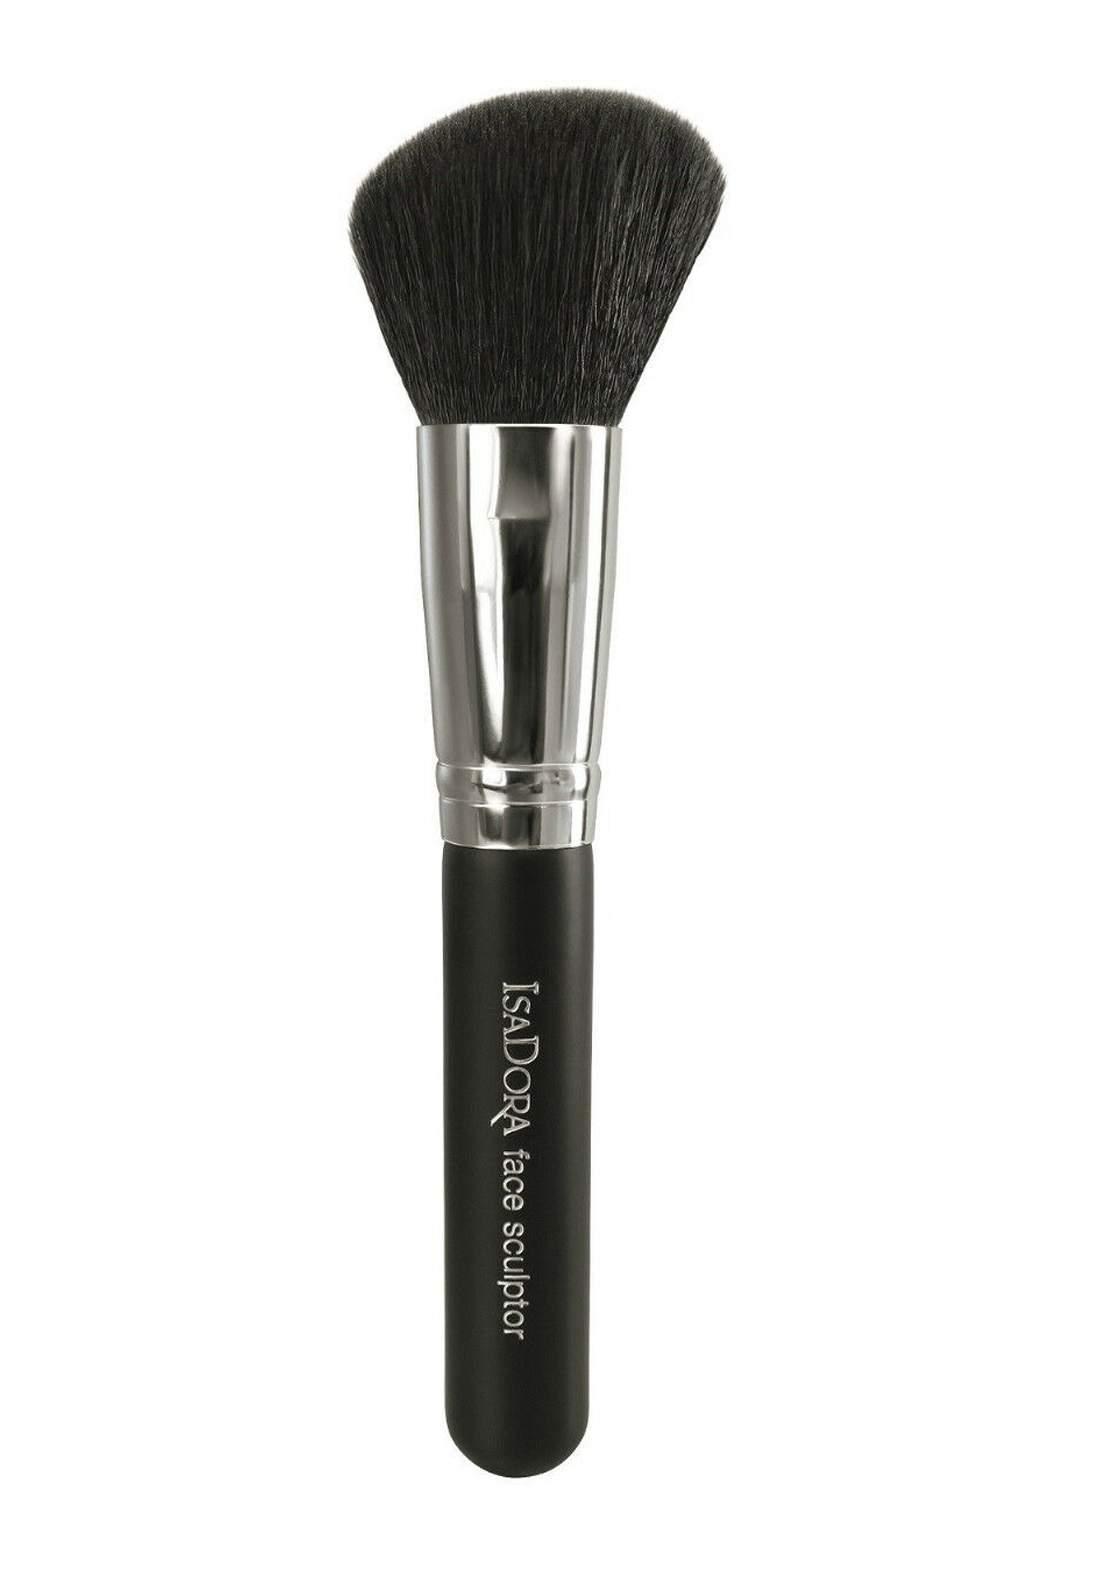 314180 Isadora Accessories - Face Sculptor Blush Brushفرشاة أحمر الخدود